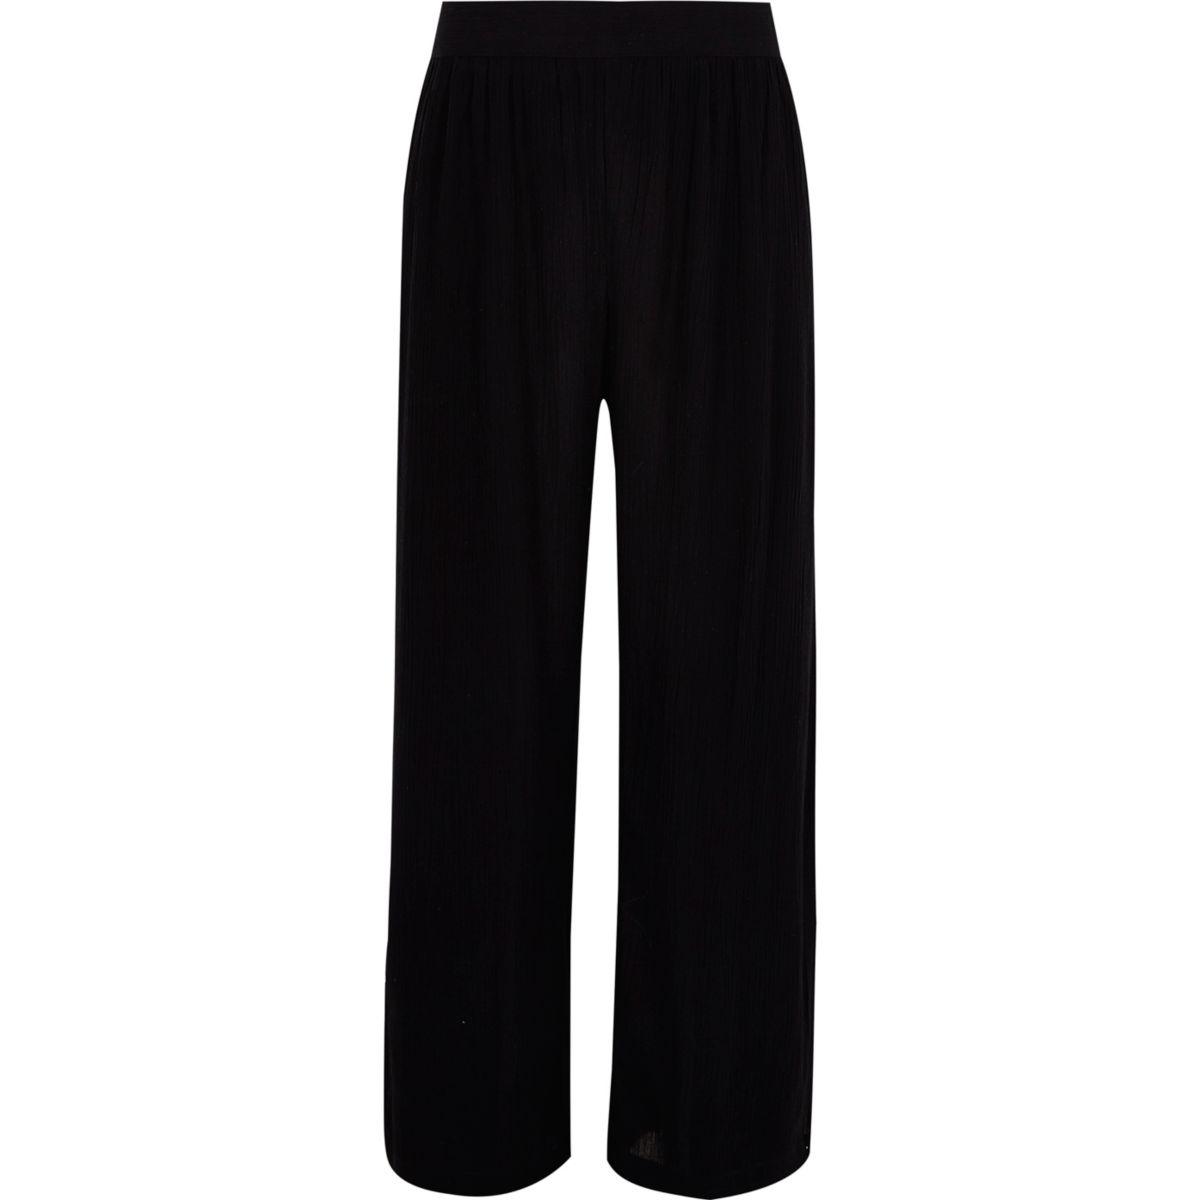 Girls black palazzo wrap trousers